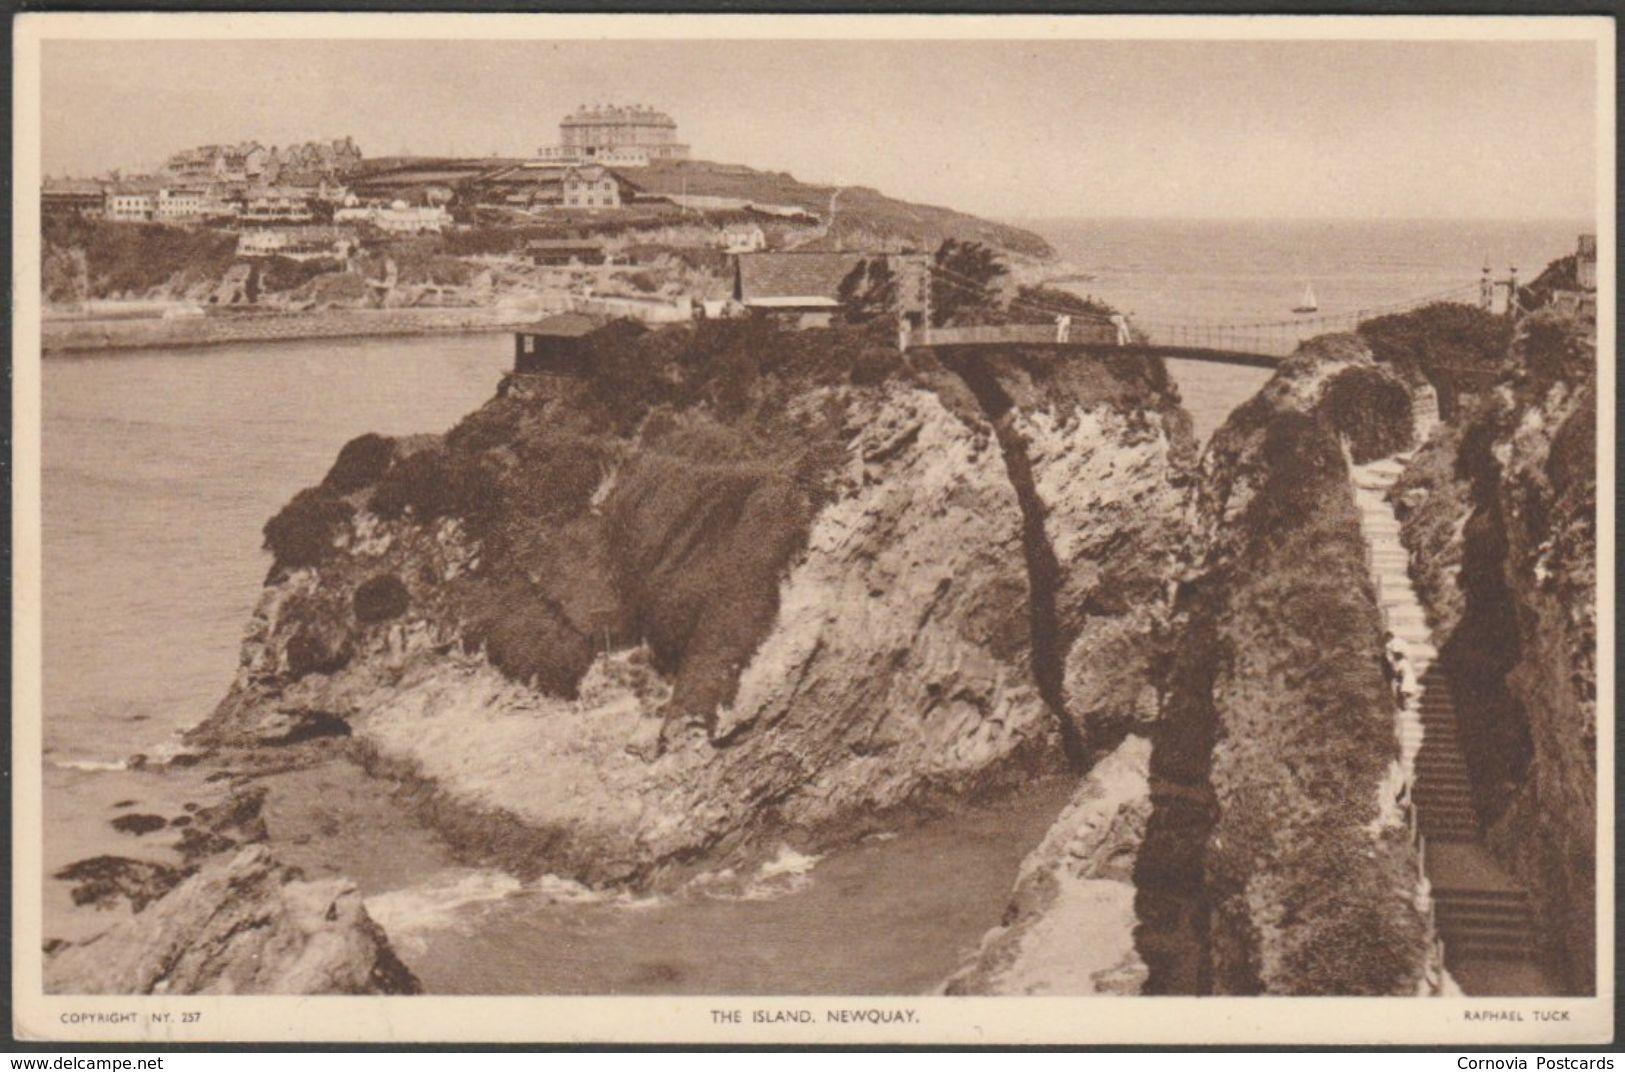 The Island, Newquay, Cornwall, c.1940s - Tuck's Postcard